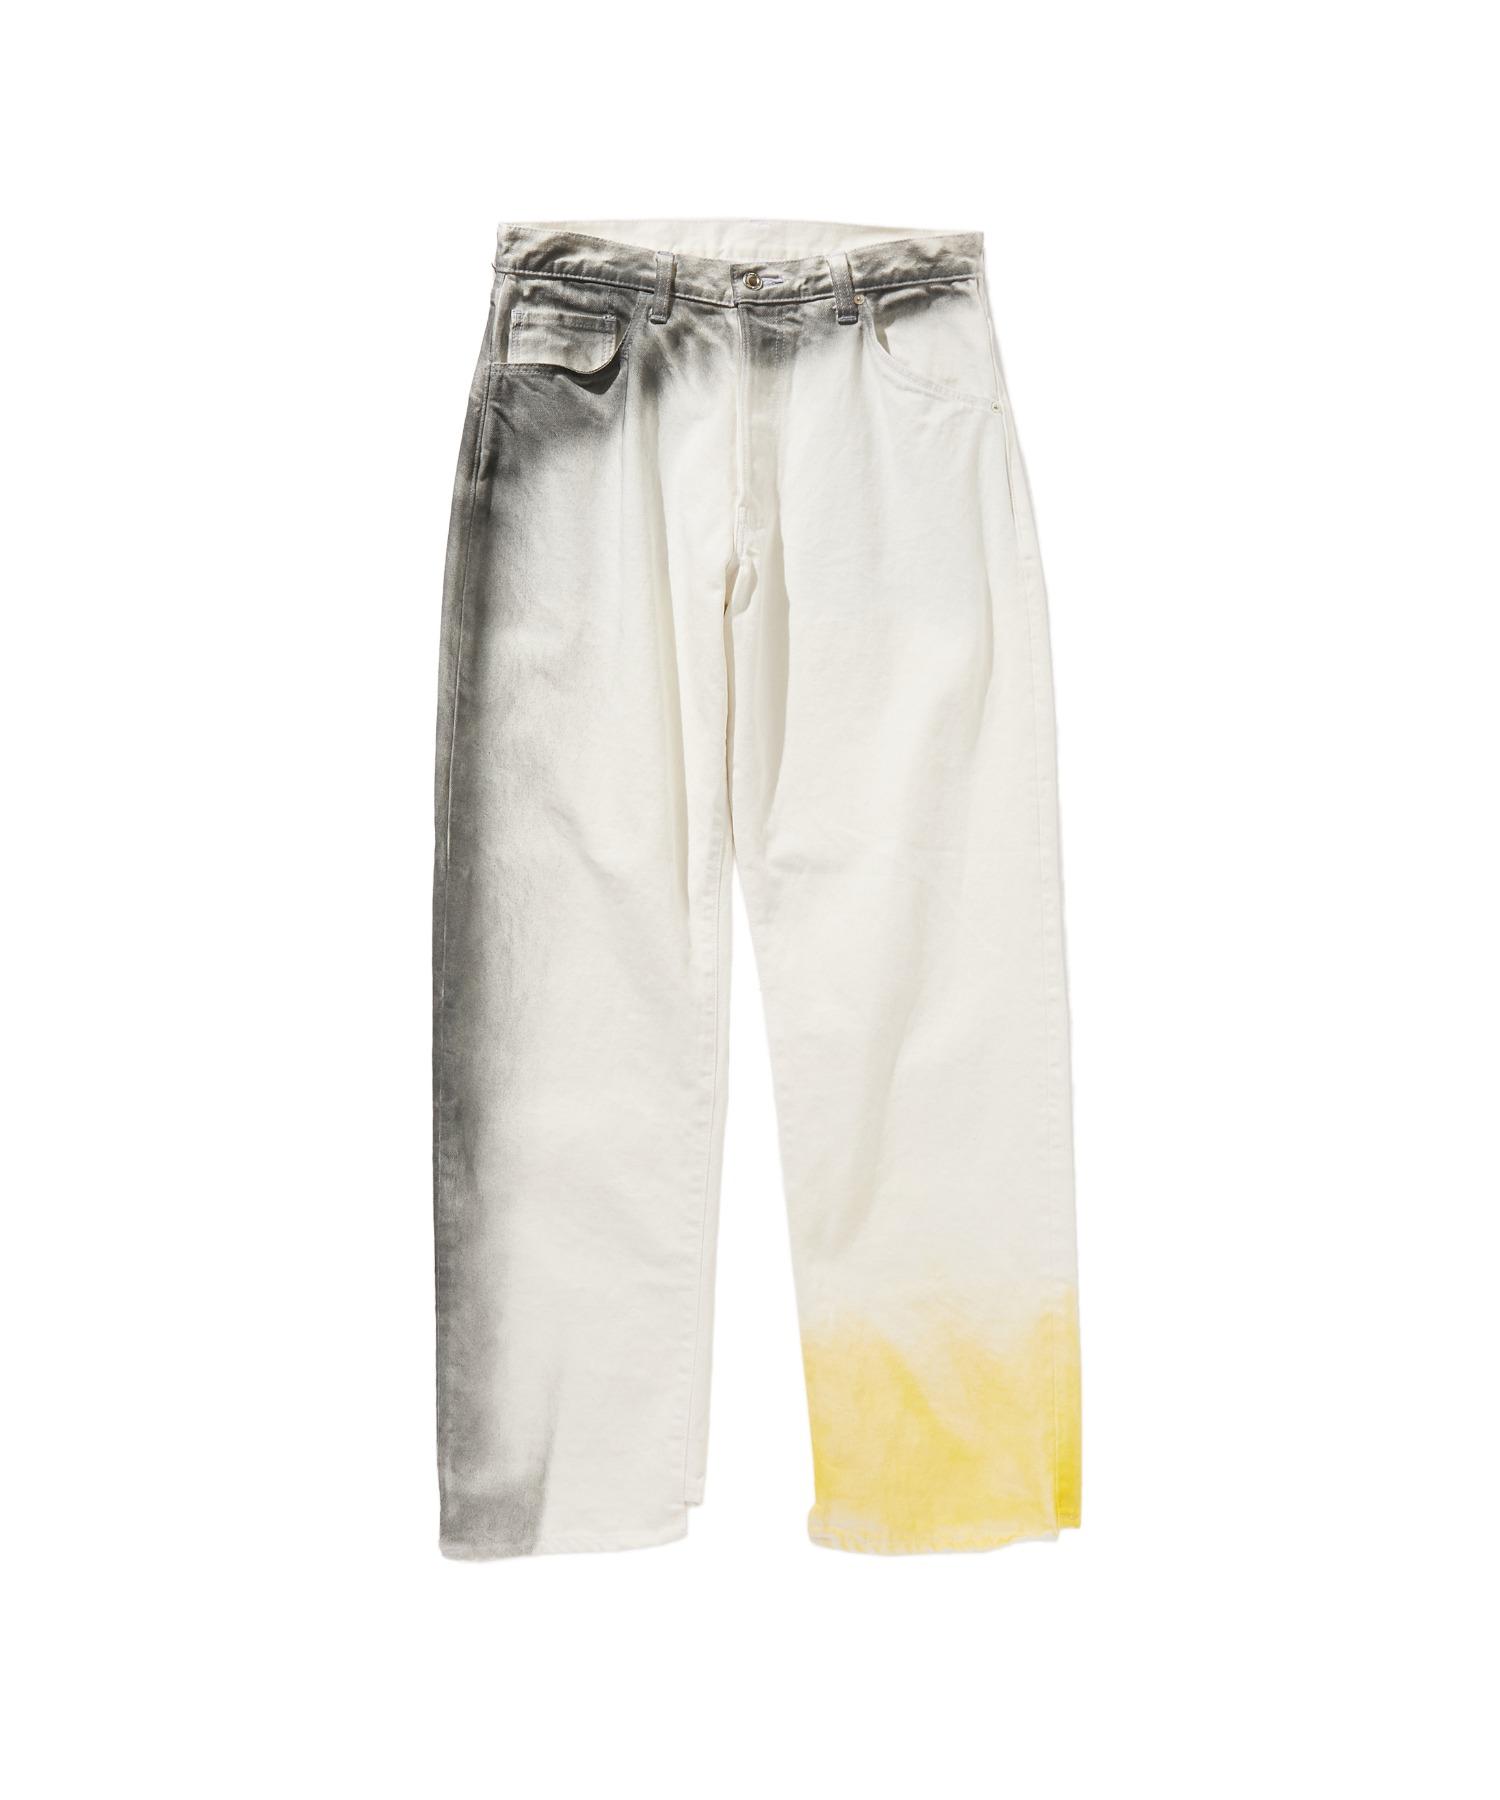 SPRING20120 TAPERED DENIM PANTS